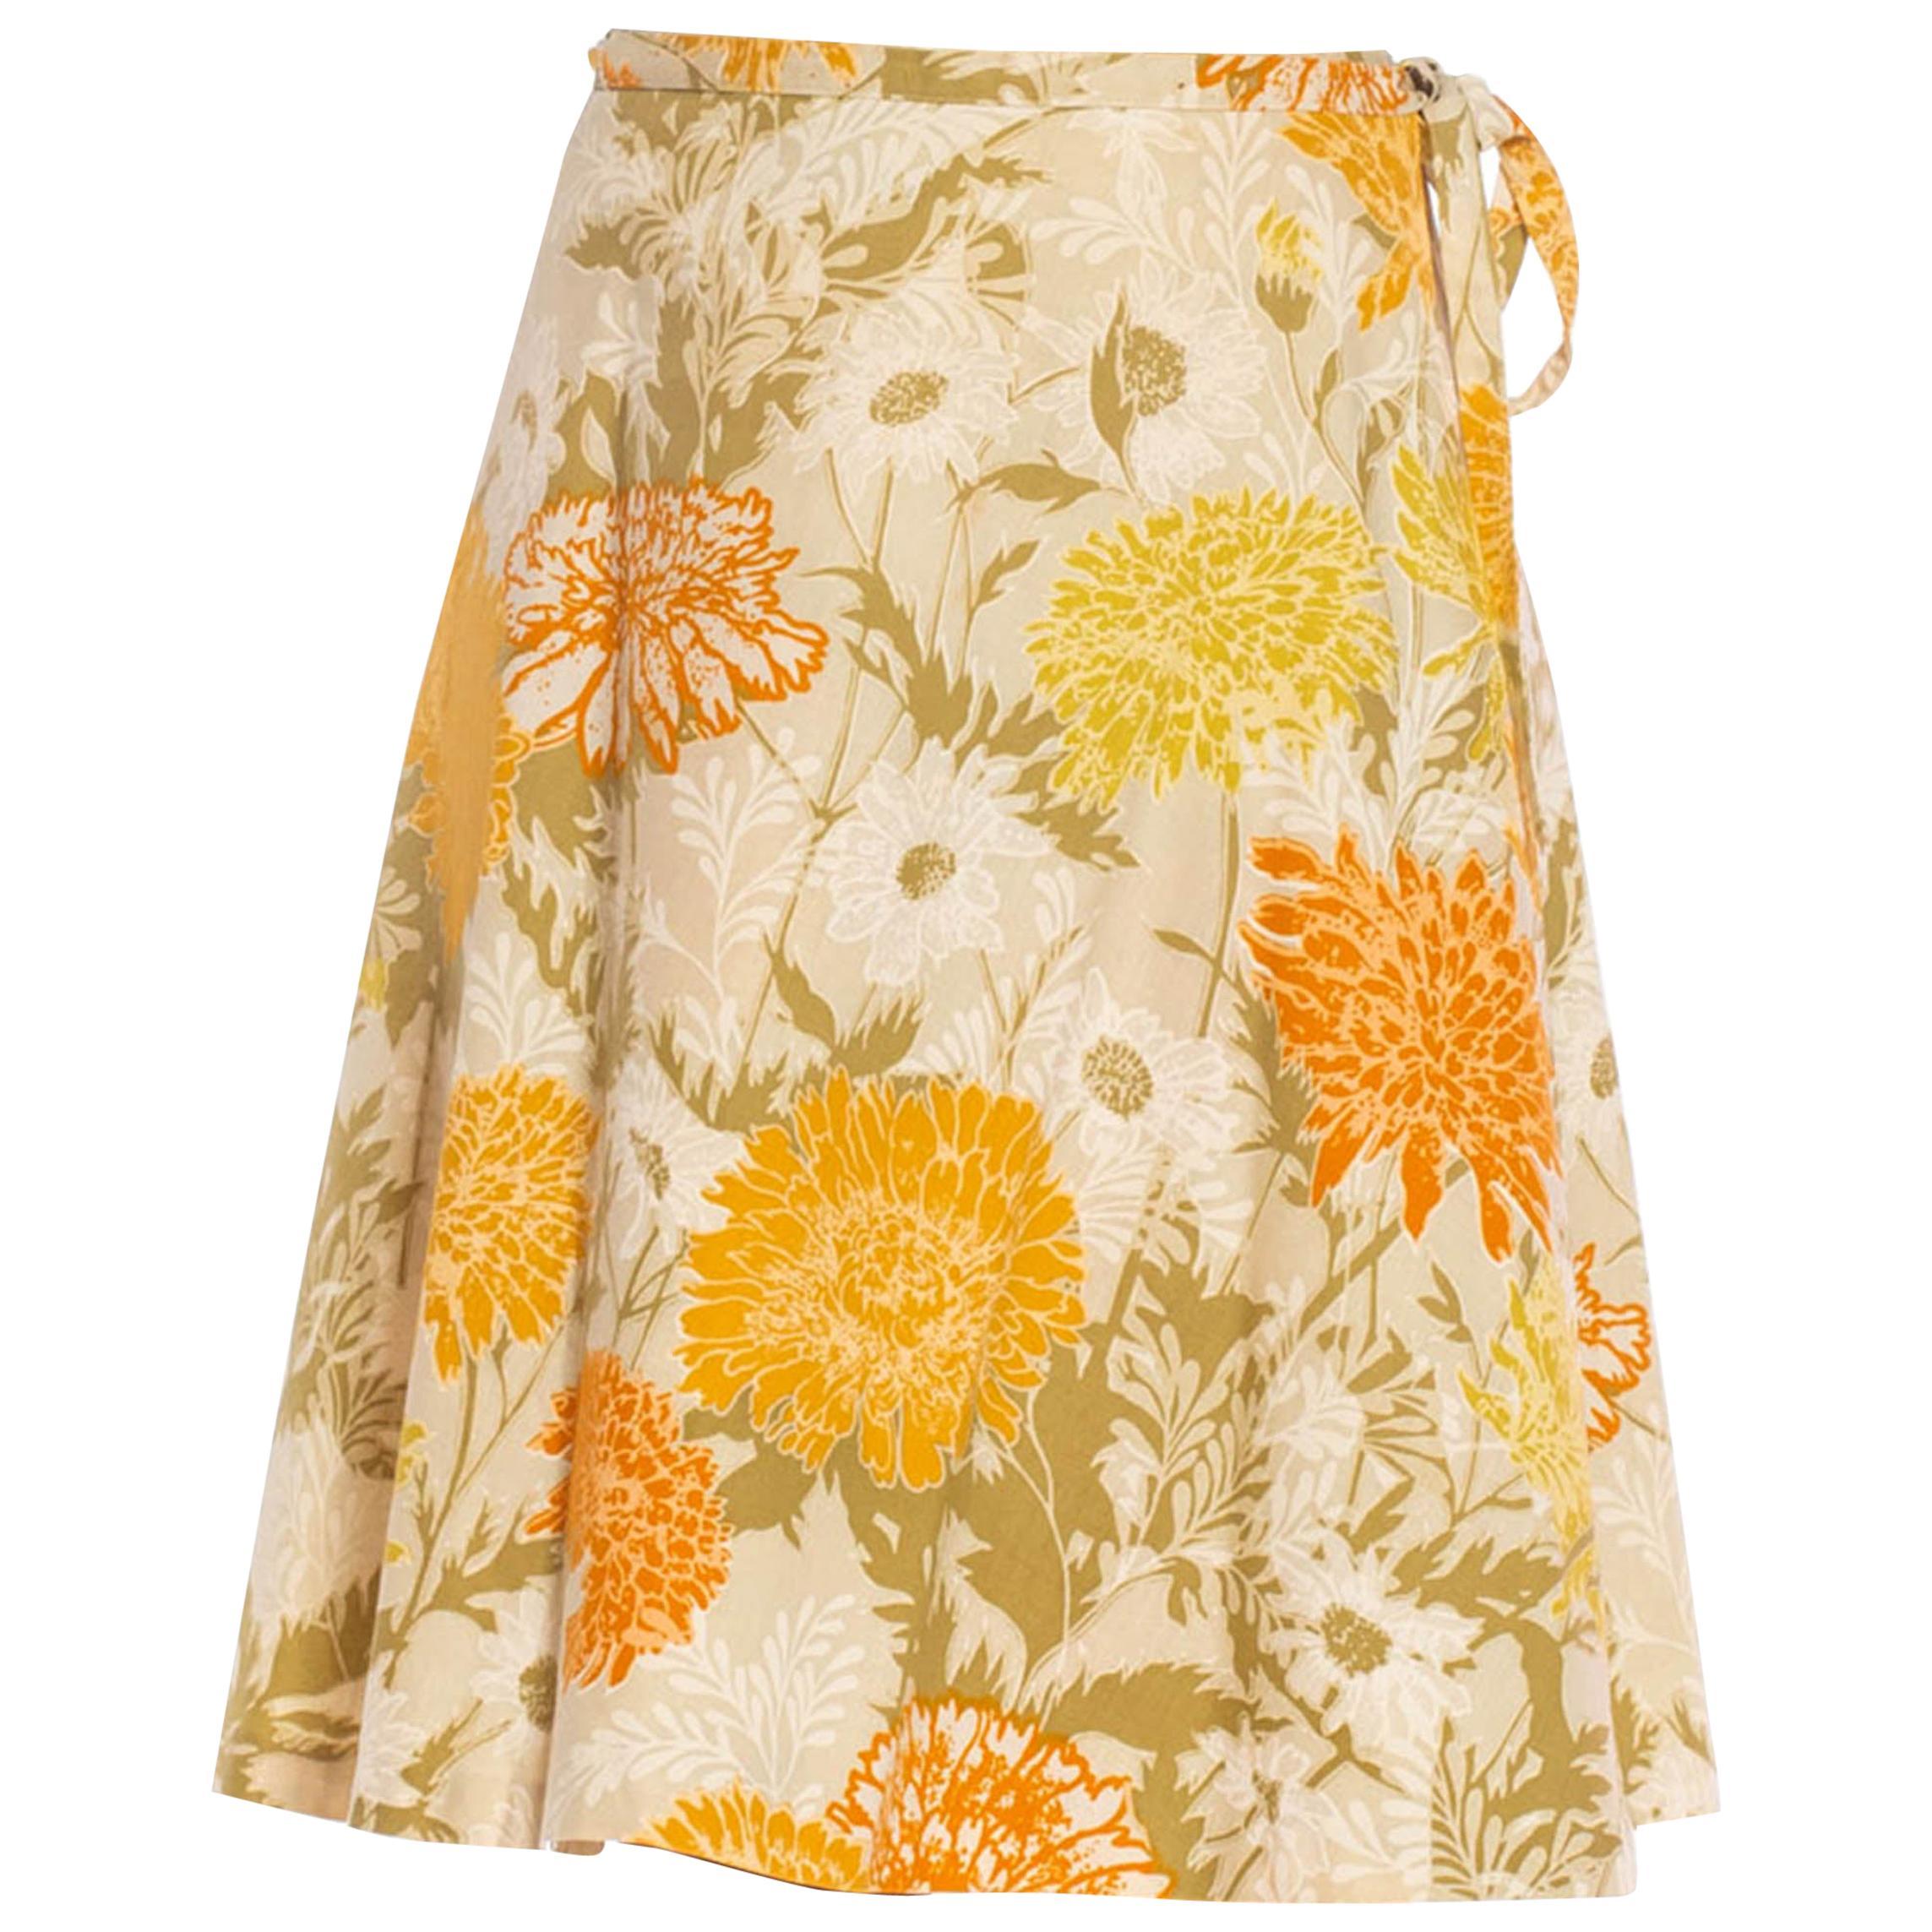 1970S Orange & Beige Cotton Floral Wrap Skirt